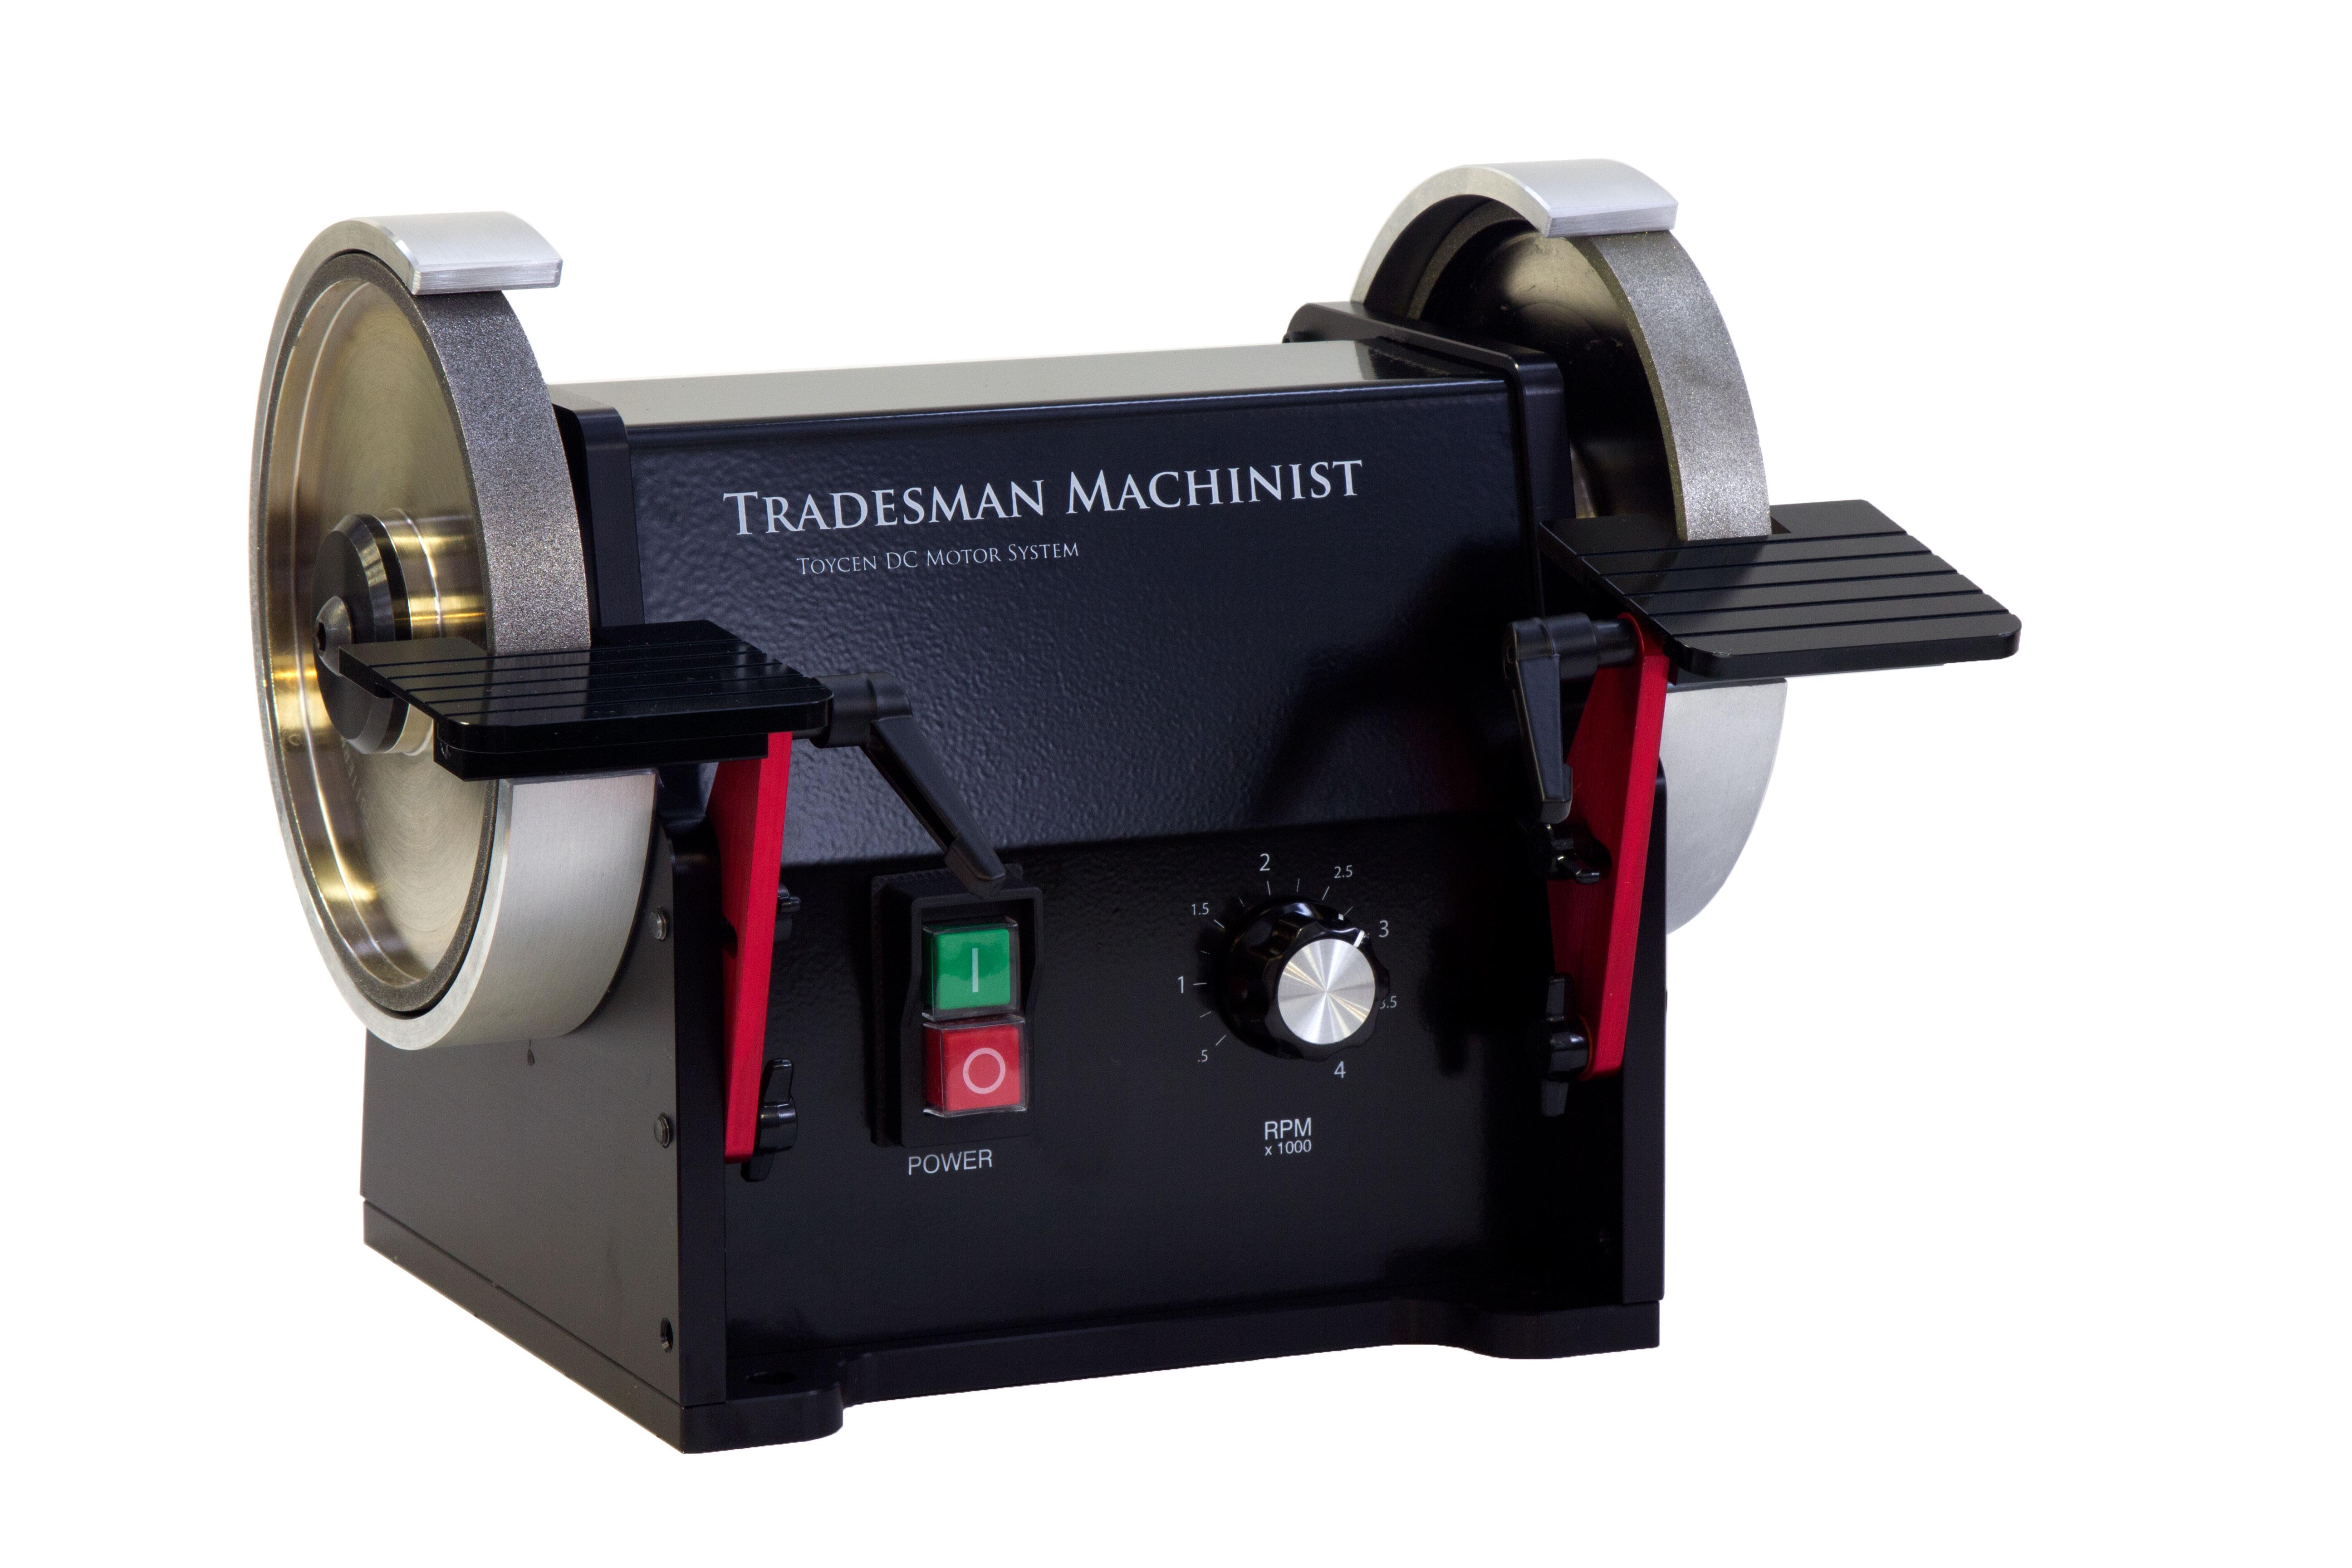 Tradesman Machinist Dc Necks Flats Basic 2017 Tradesman